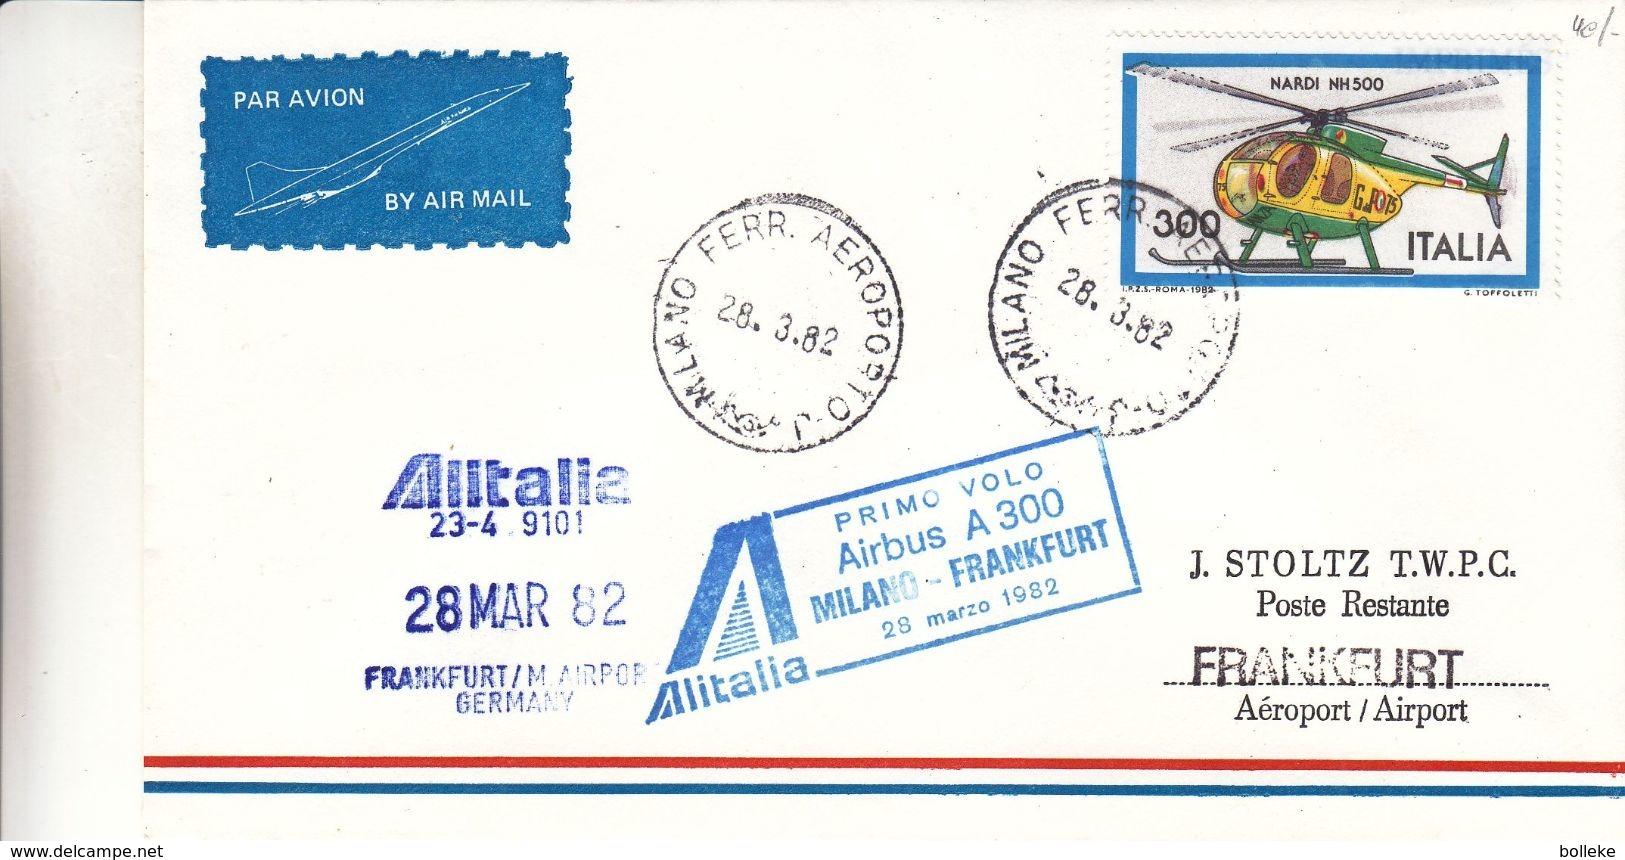 Italie - Lettre De 1982 - Oblit Milano - 1er Vol Airbus Milano  Frankfurt - Hélicoptère - 1981-90: Storia Postale